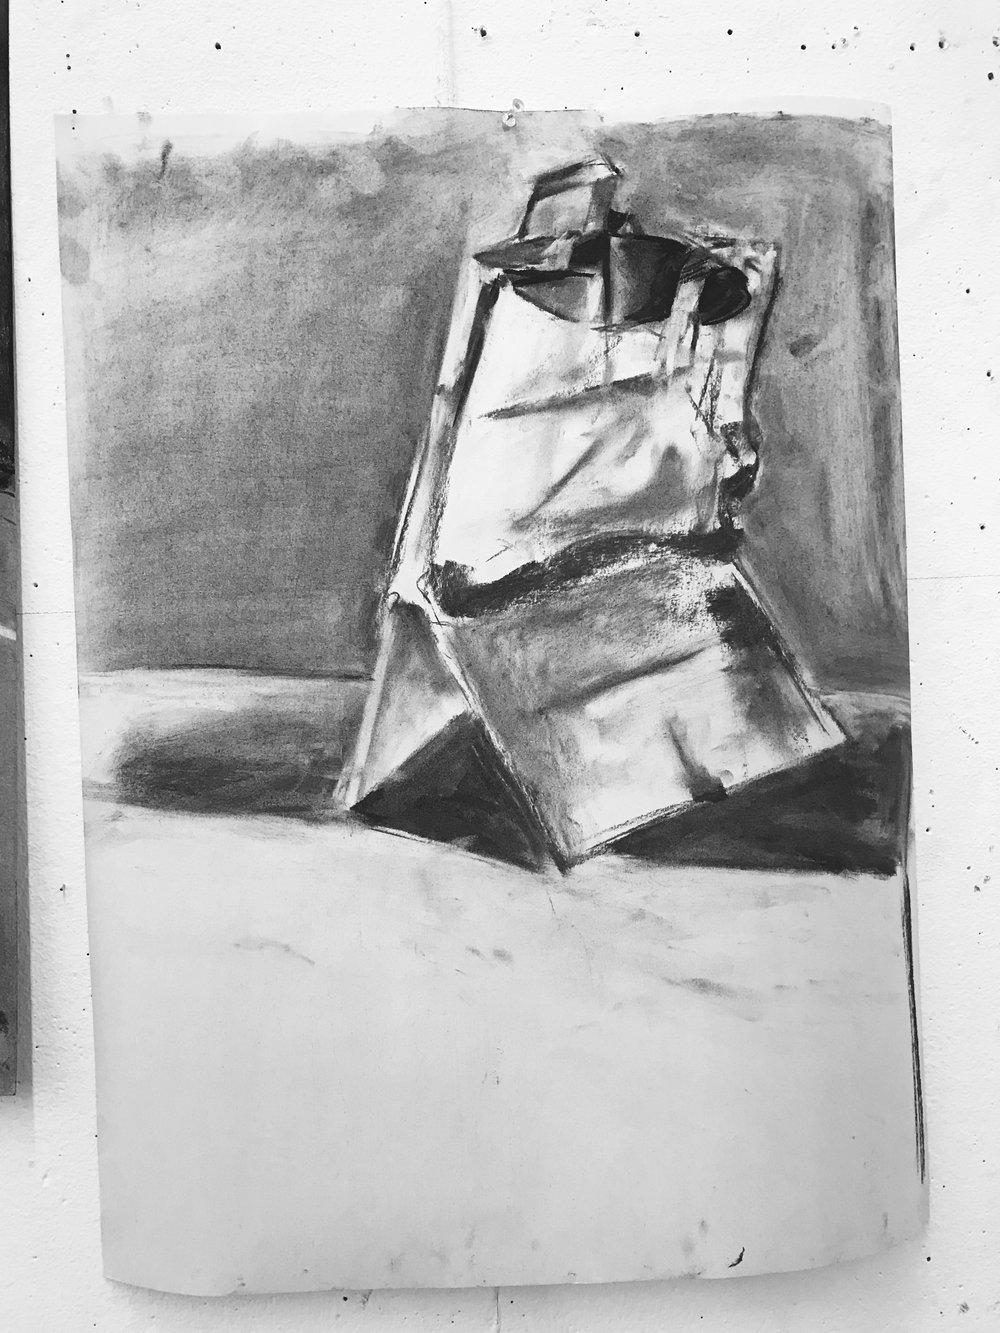 10 min bag study in charcoal